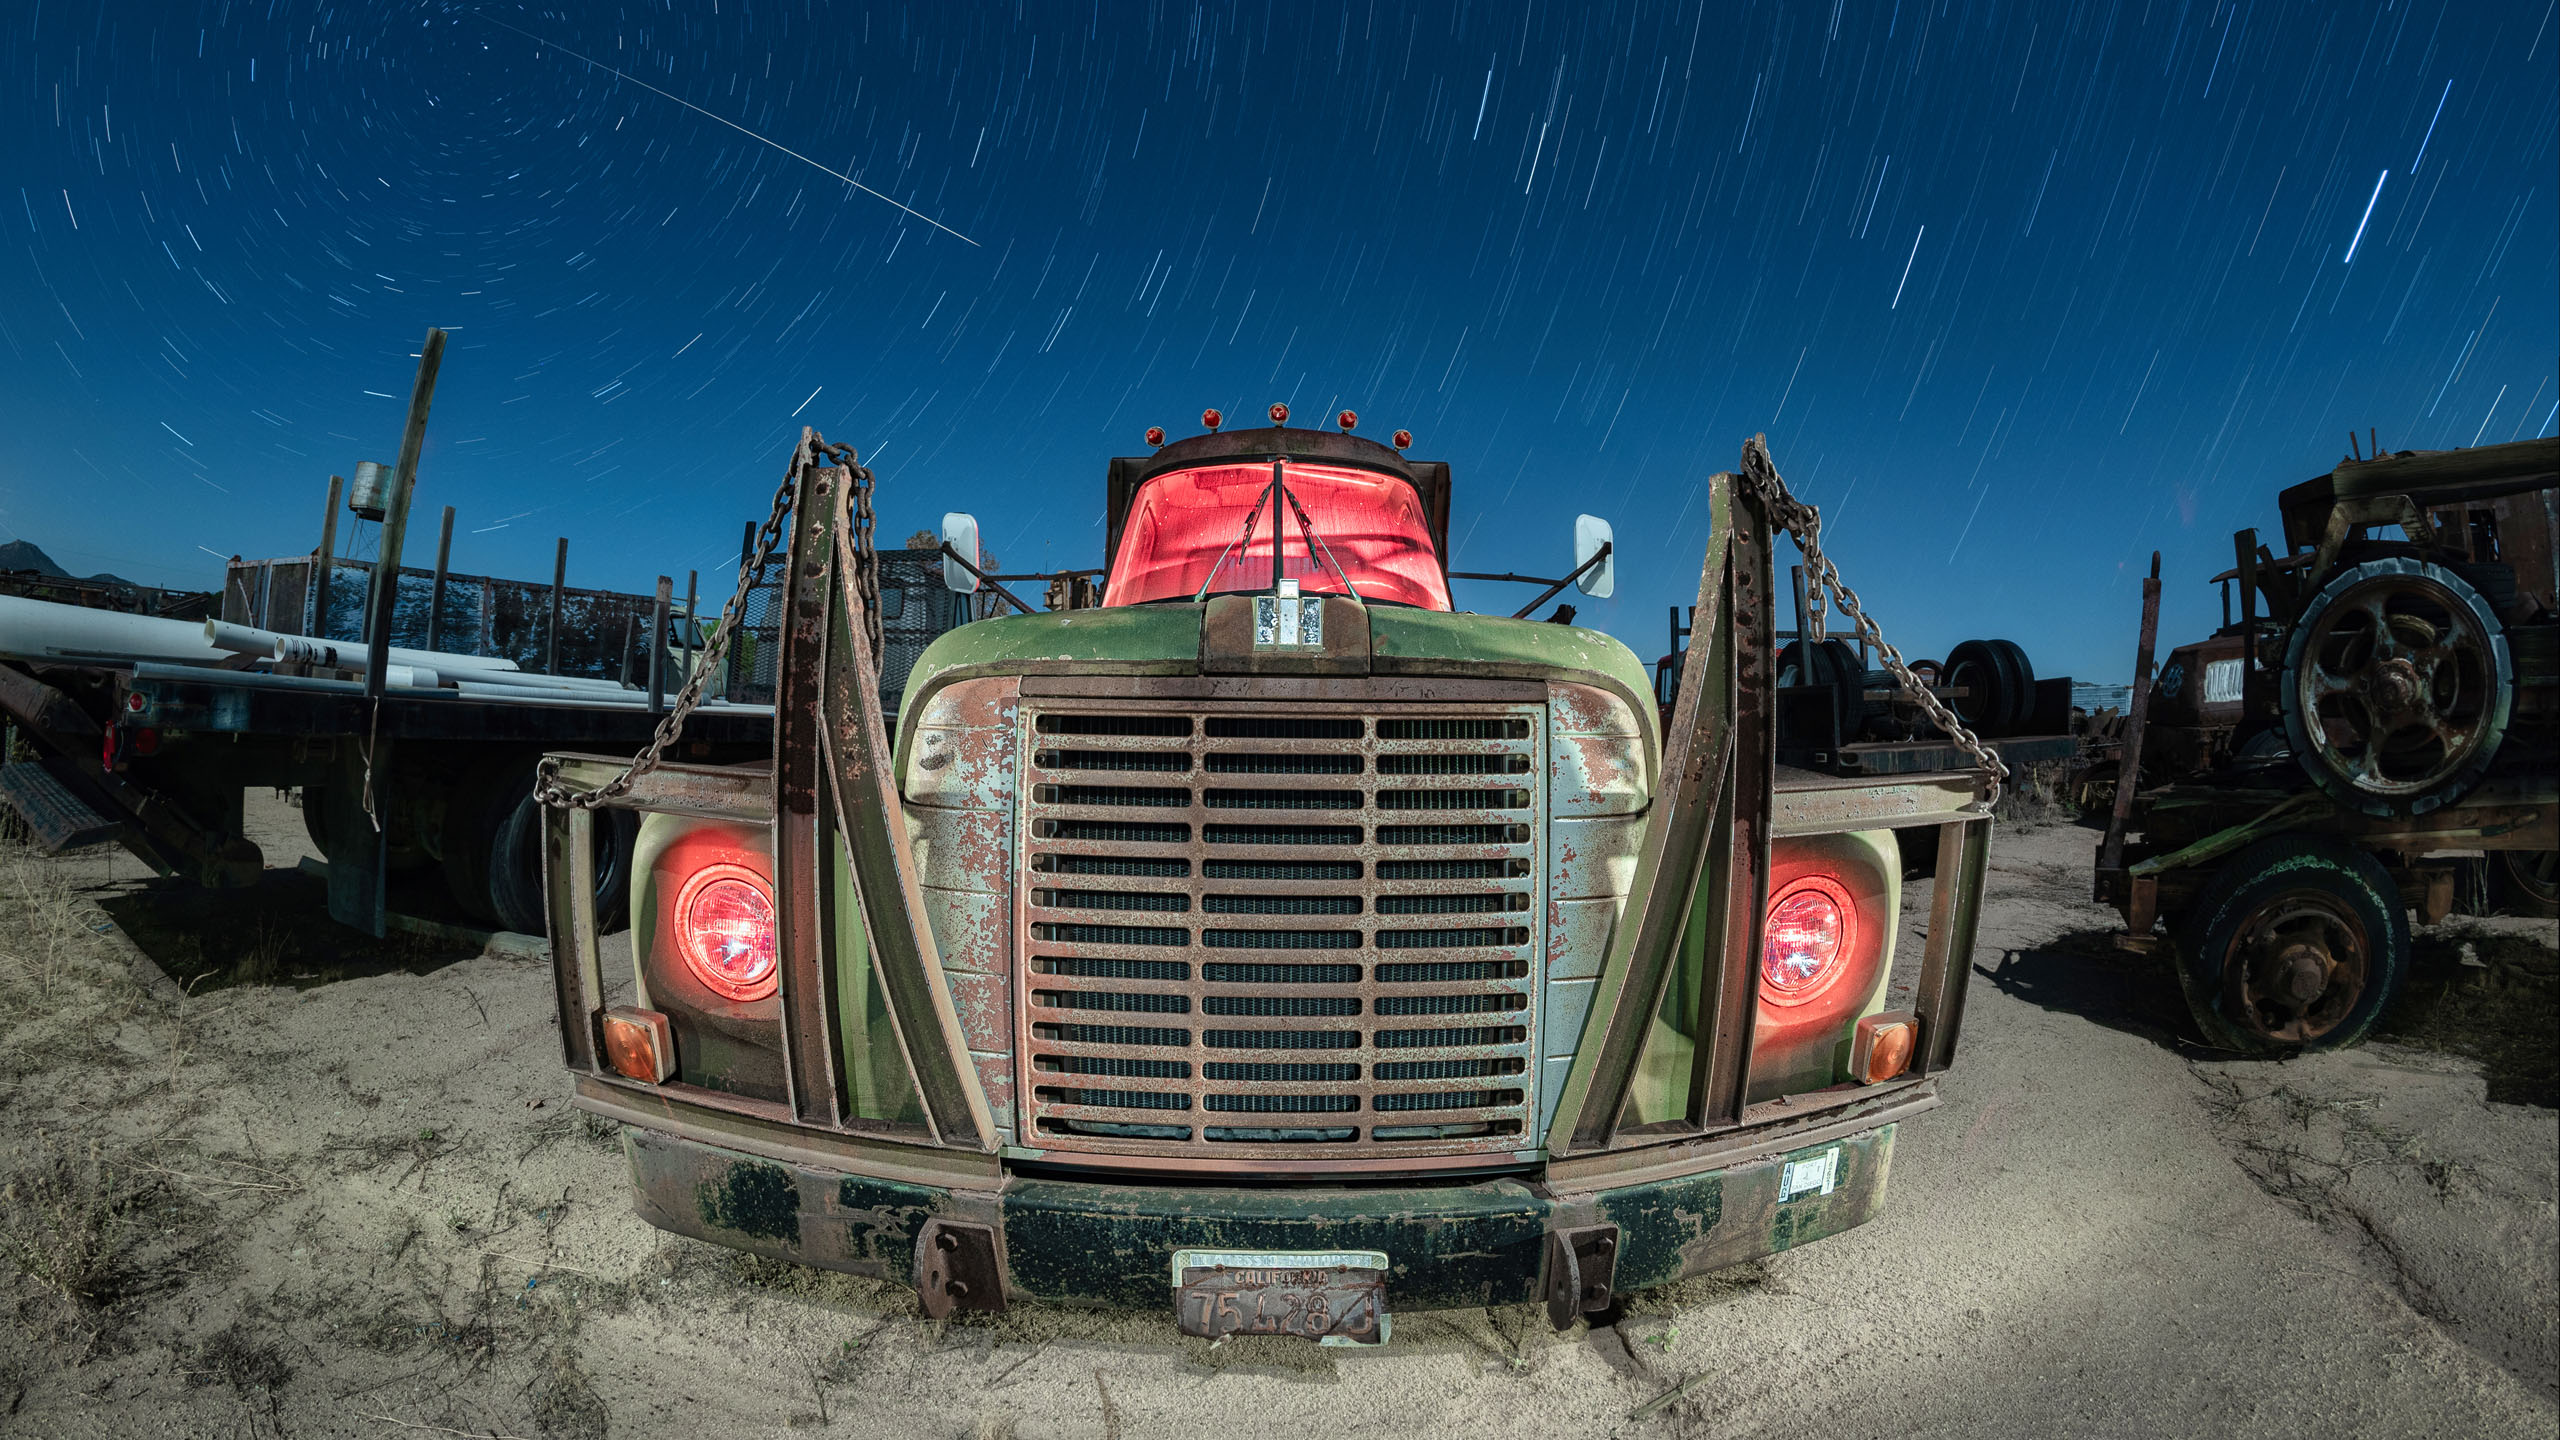 7451_kenlee_motor-transport-museum_201126_0000_19pt8mtotal_149sf8iso250_fisheye_rinternational-loadstar-1600-truck-front-grill-red-brighter-straighter-HEADER-PHOTOFOCUS-2560X1440px